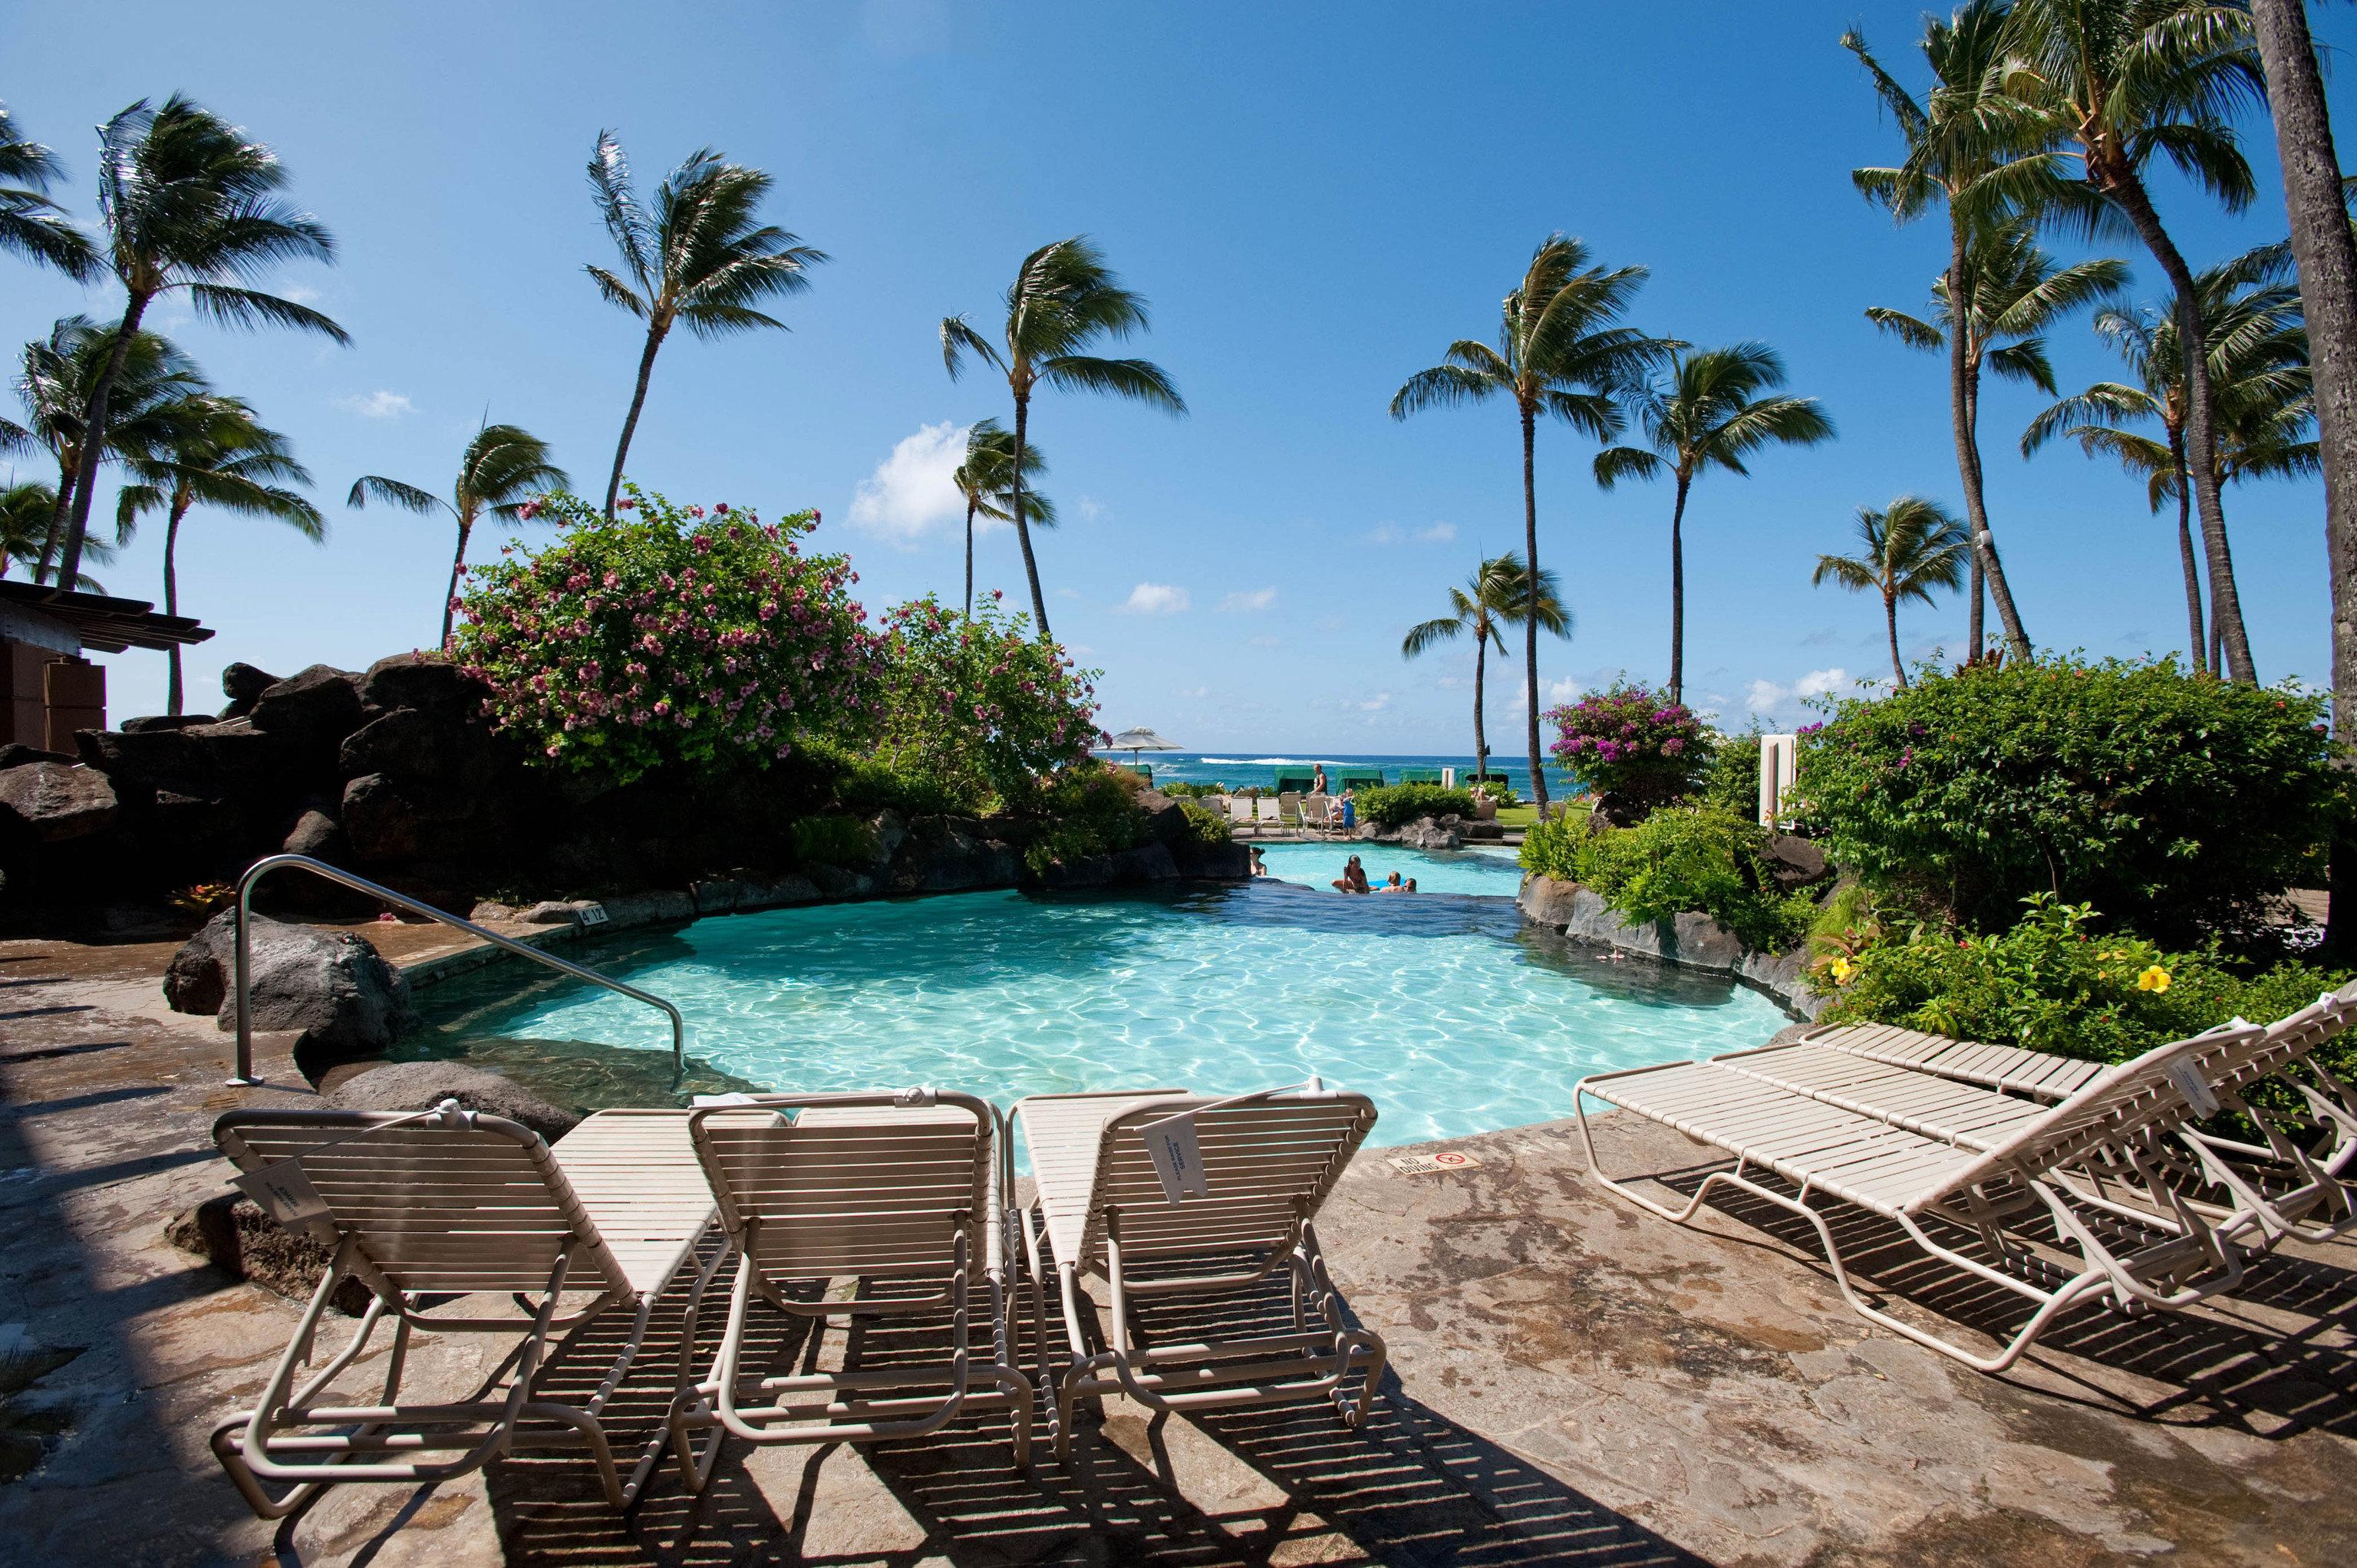 tree sky chair umbrella swimming pool leisure property Resort lawn caribbean Villa arecales lined Beach backyard Sea mansion palm sunny shade set day sandy